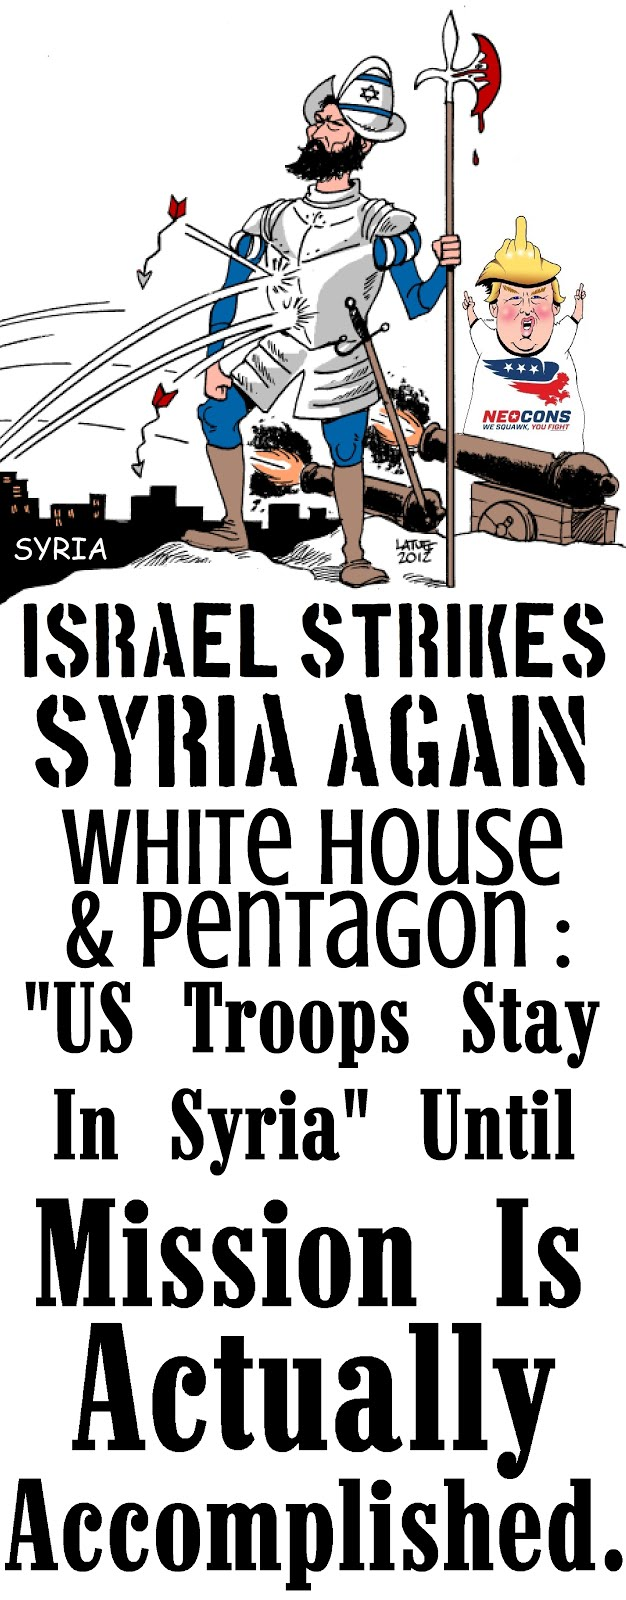 Israel Strikes Syria Again!